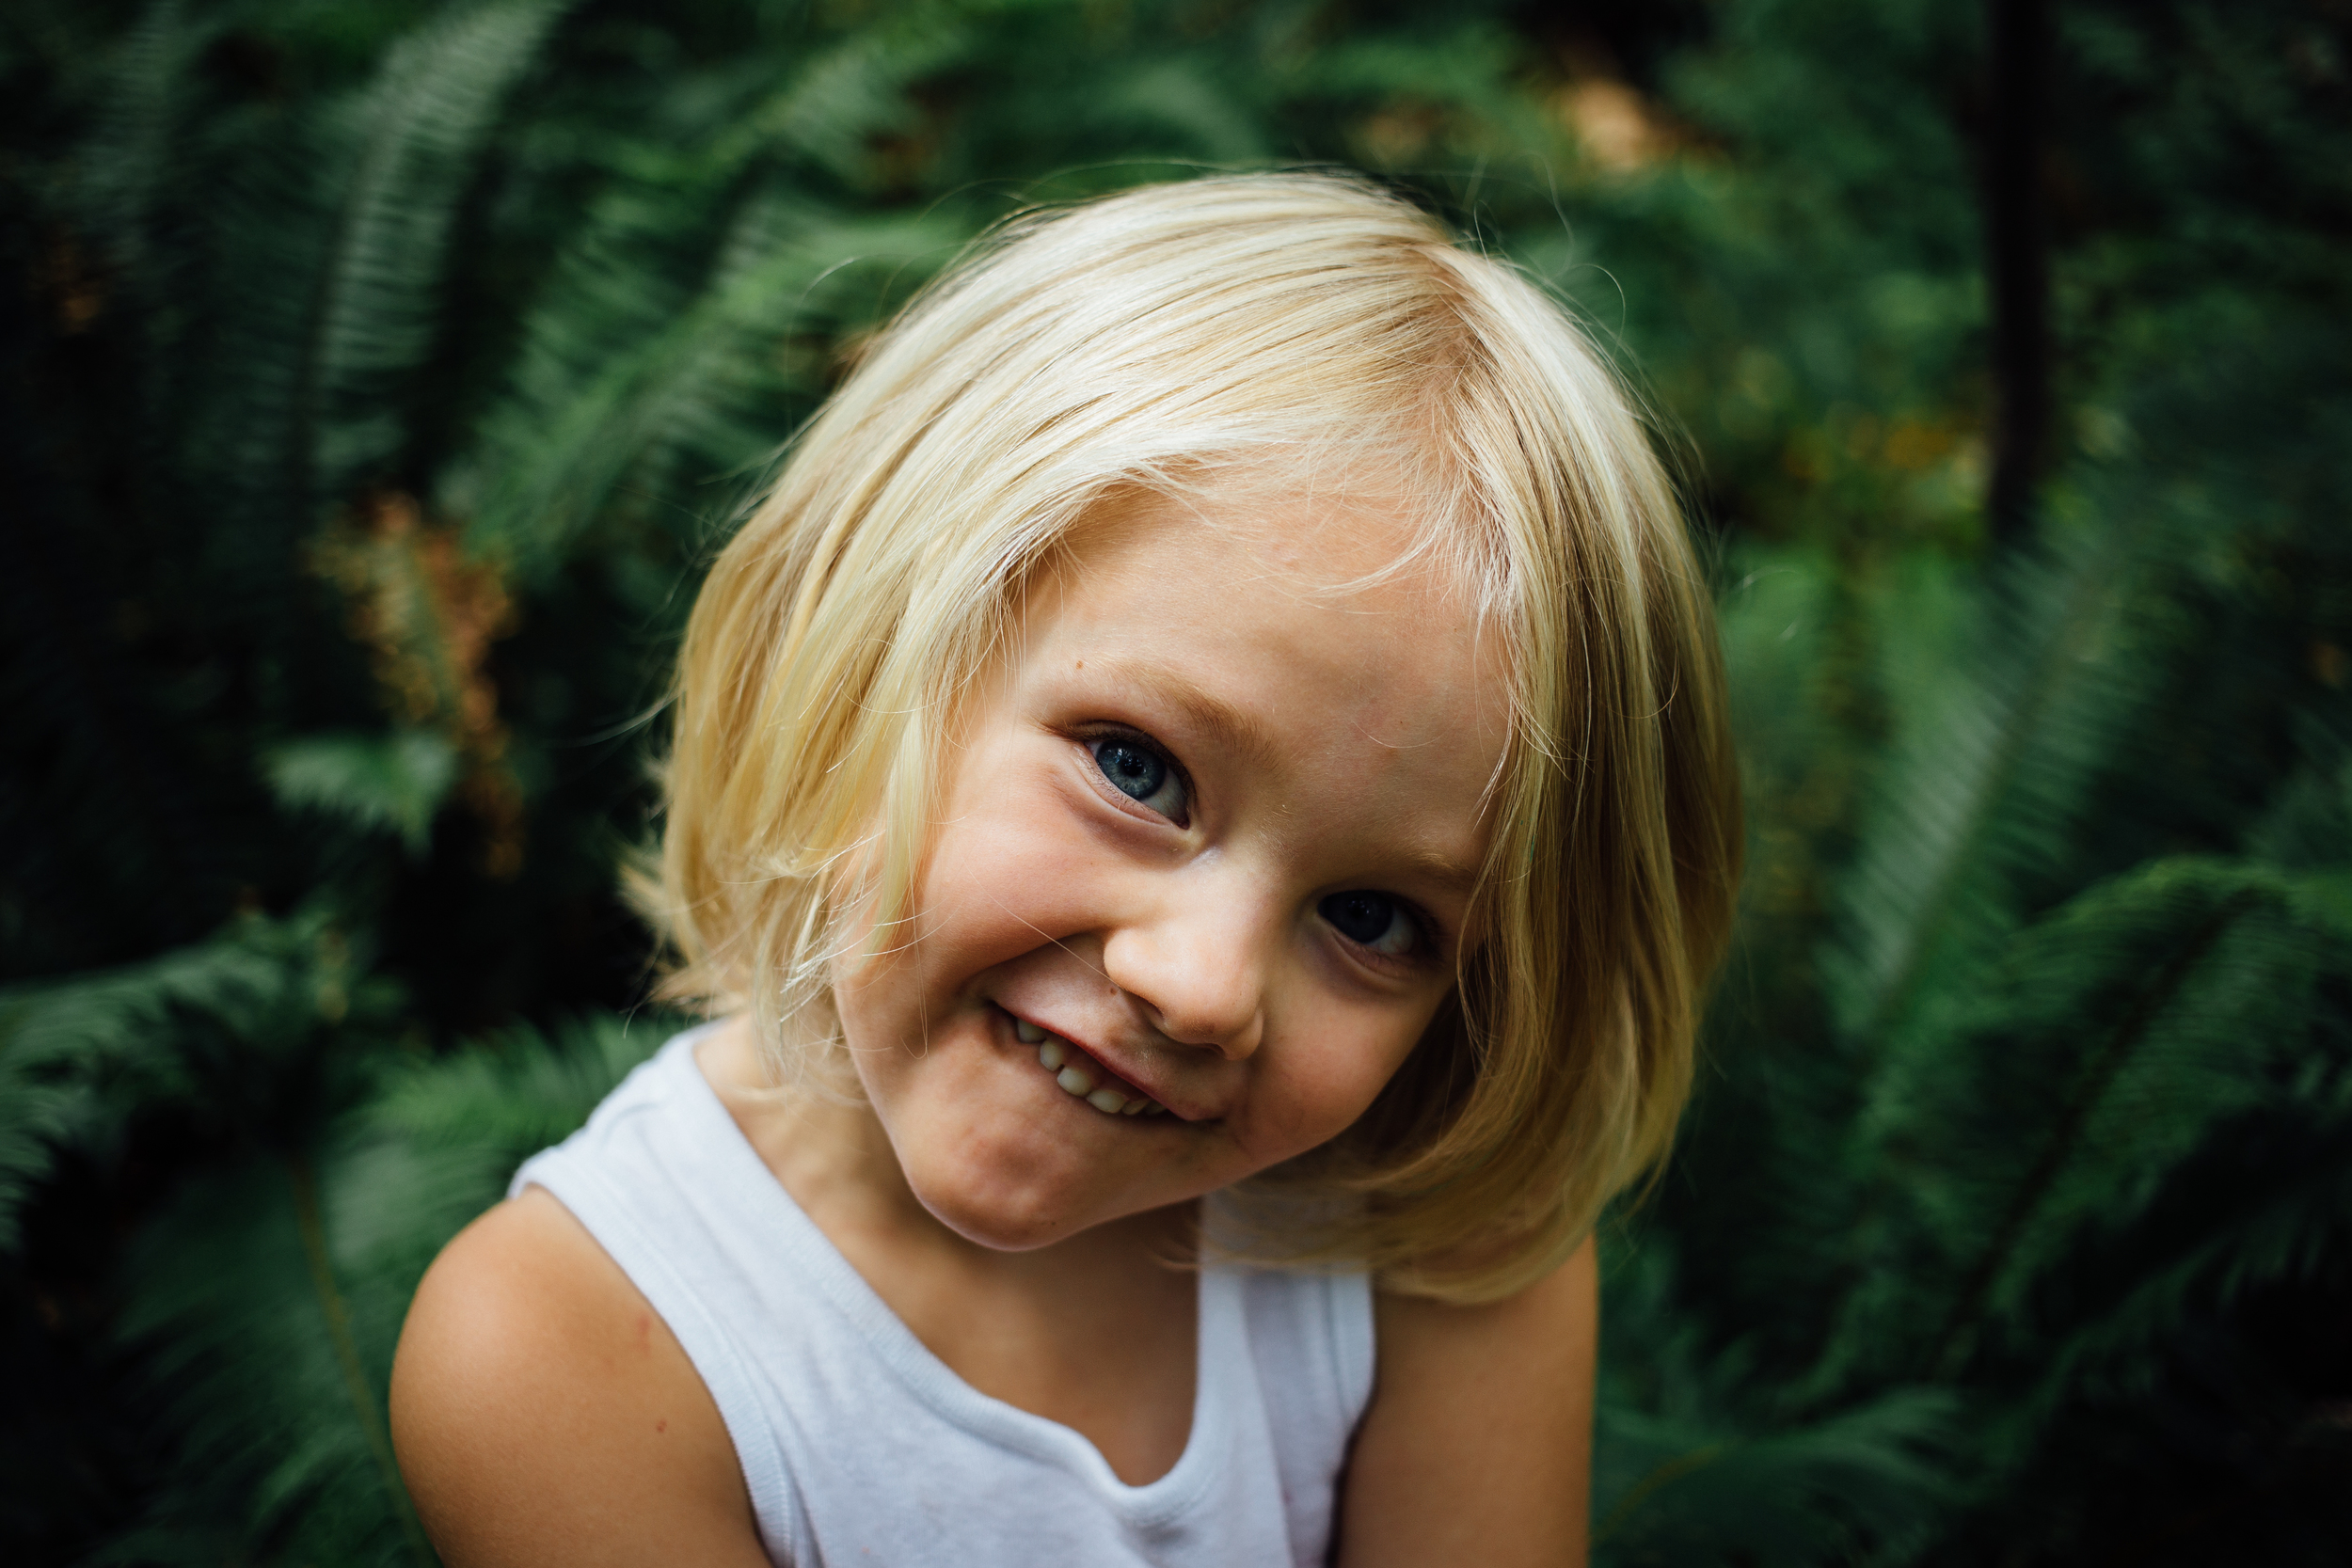 dogwoodphotography_photographer_vancouver_child_roosbday-18.jpg